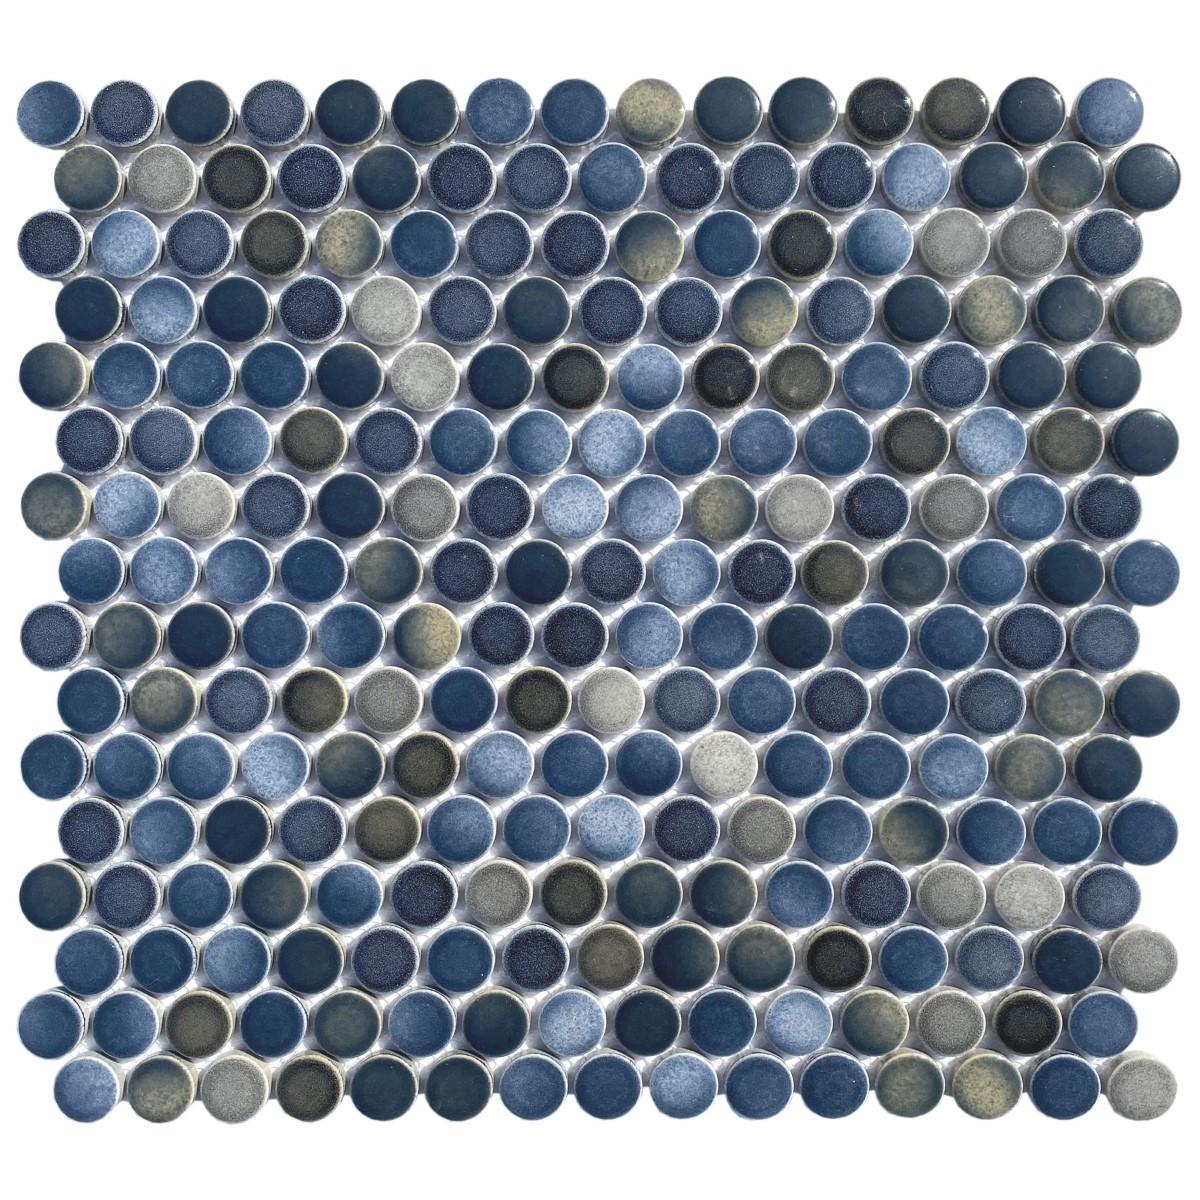 FREE SHIPPING - Blue Metallico Porcelain Penny Round Mosaic